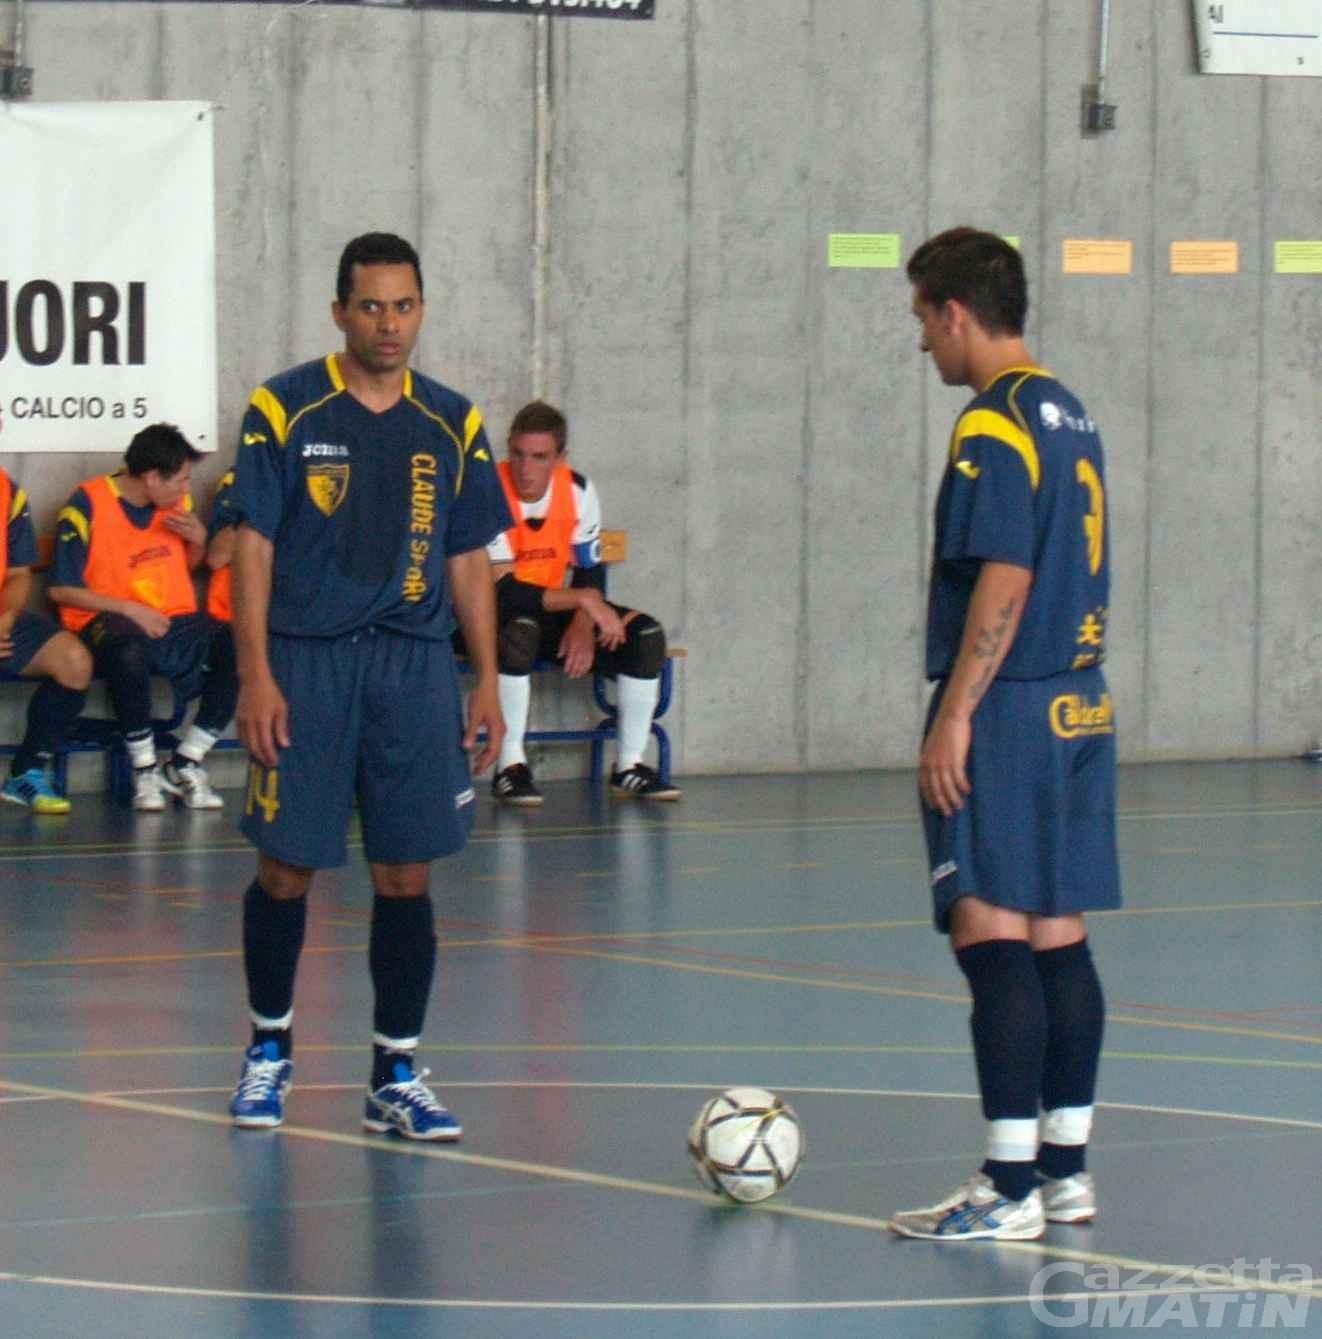 Calcio a 5: bene l'Aosta, l'Ayma ko in Sardegna